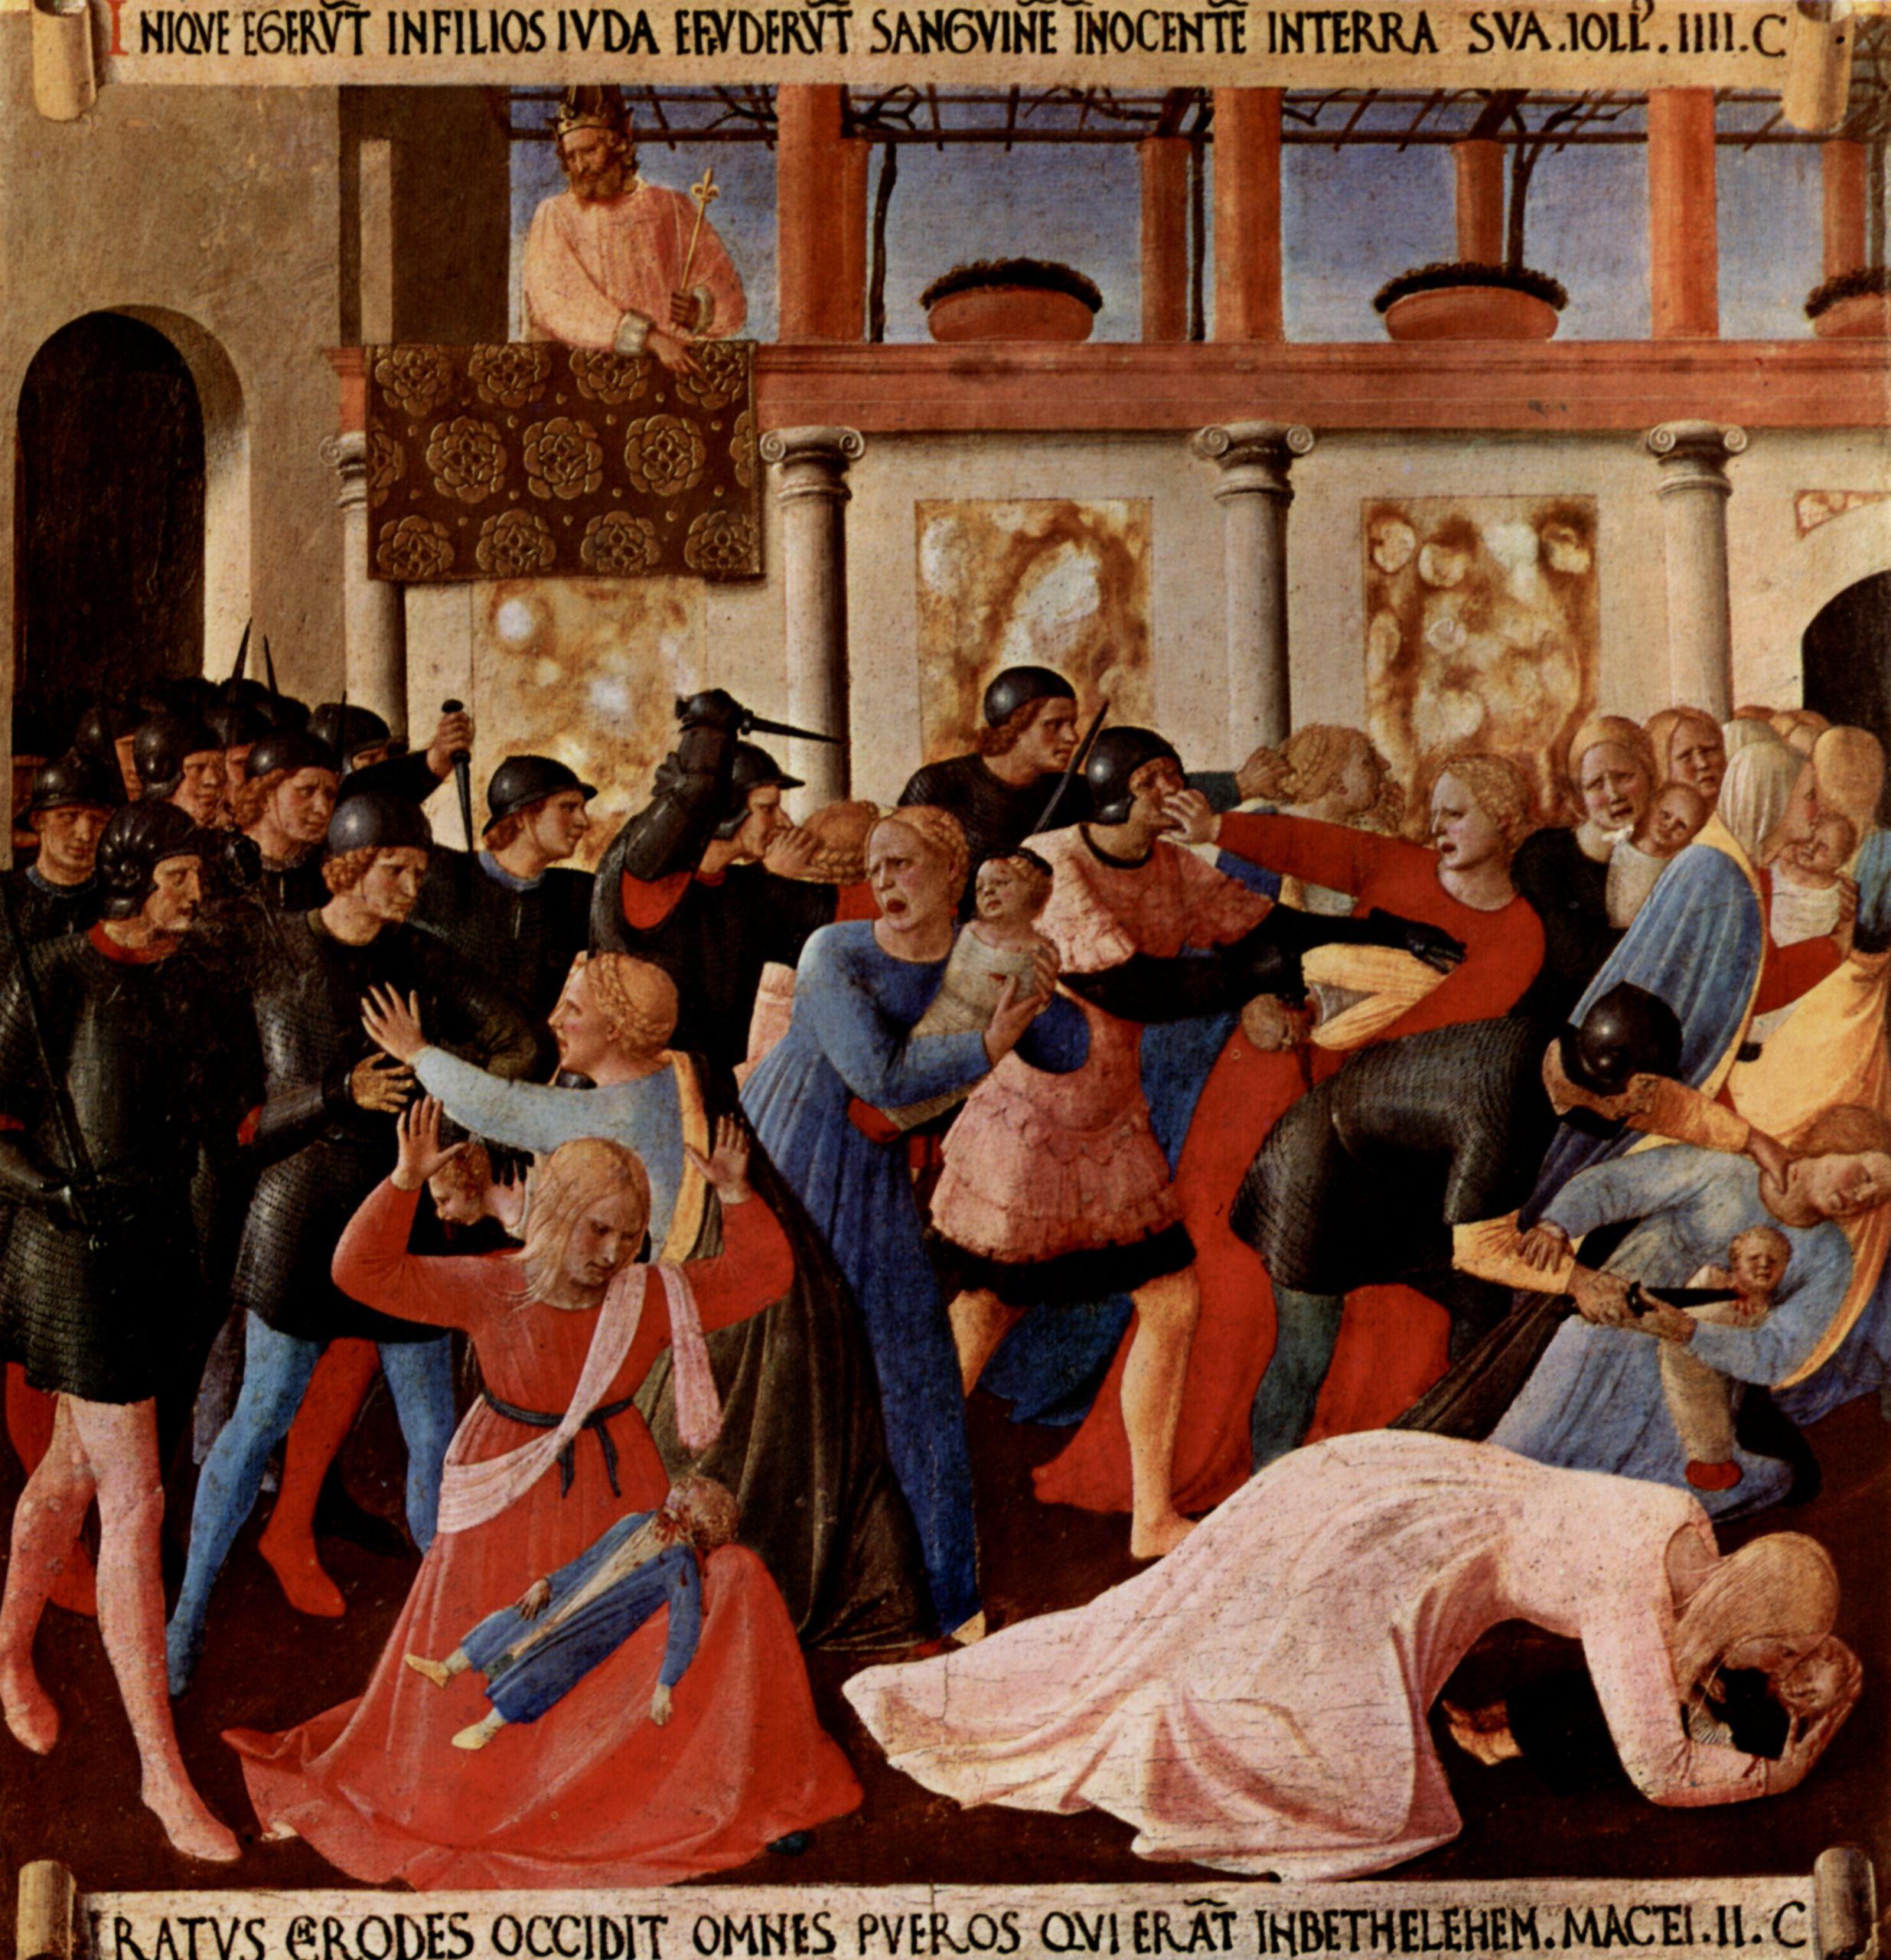 http://images.zeno.org/Kunstwerke/I/big/1180046a.jpg